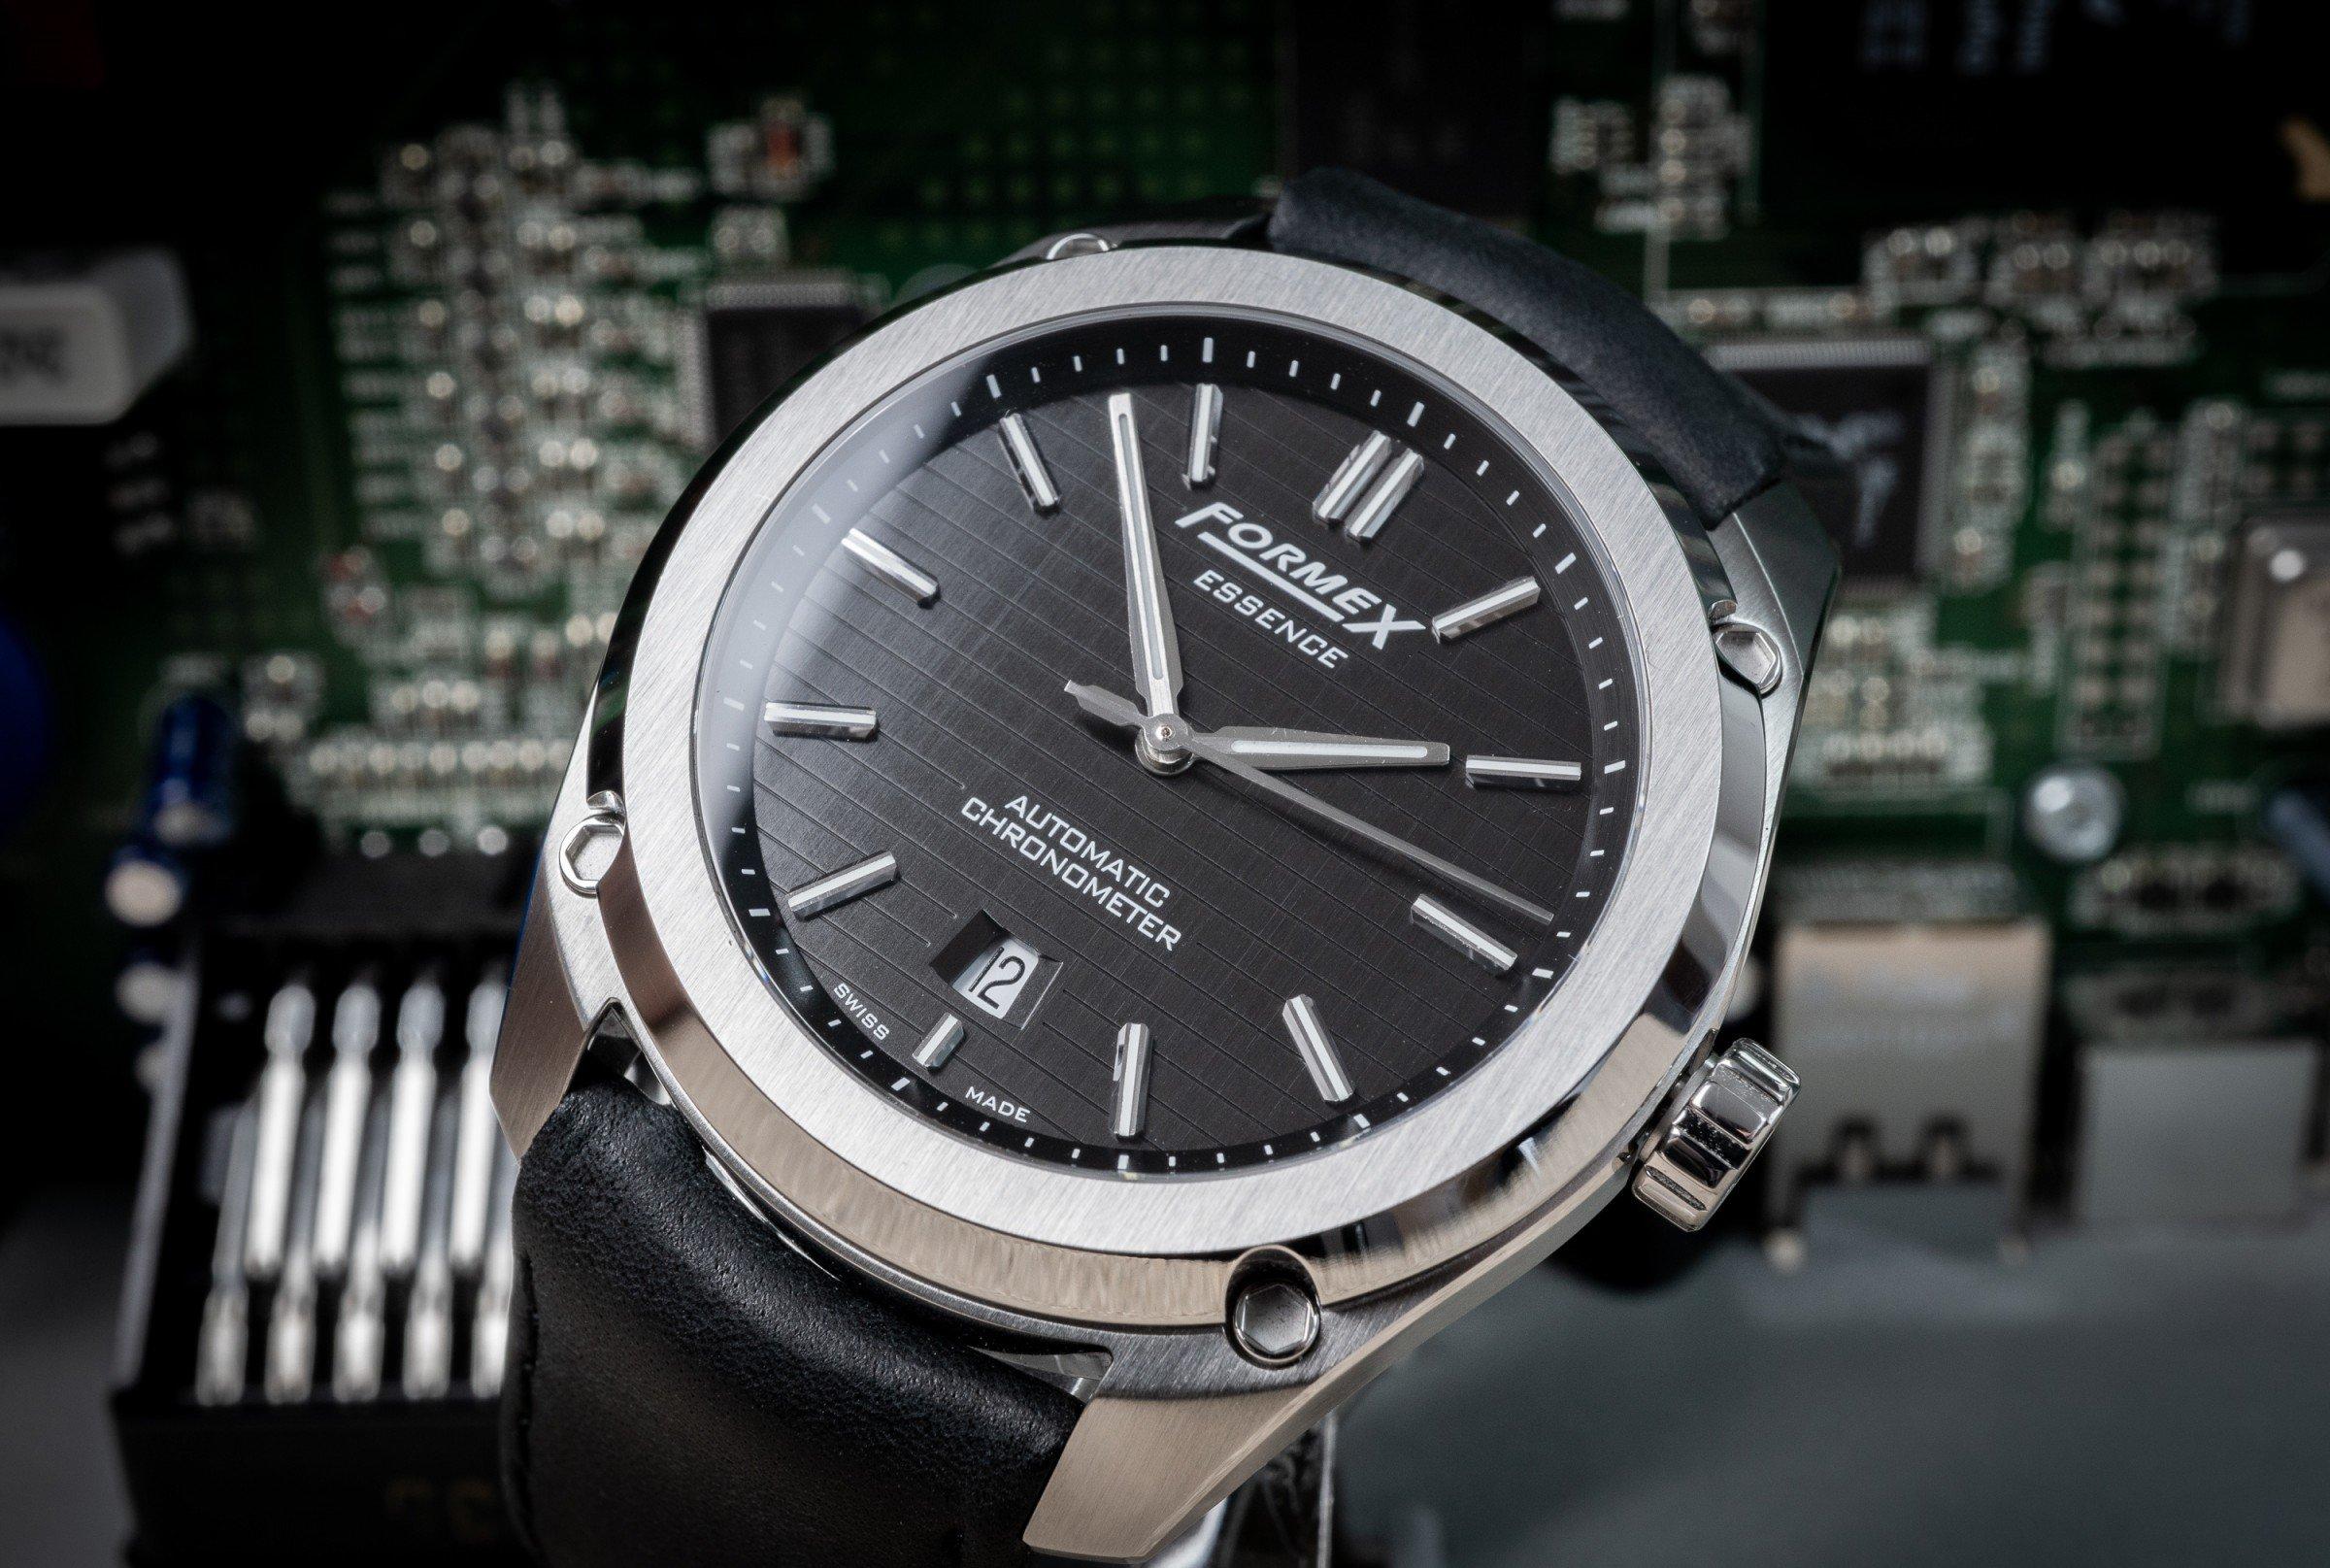 FORMEX Essence Chronometer Automatikuhr Sellita Test